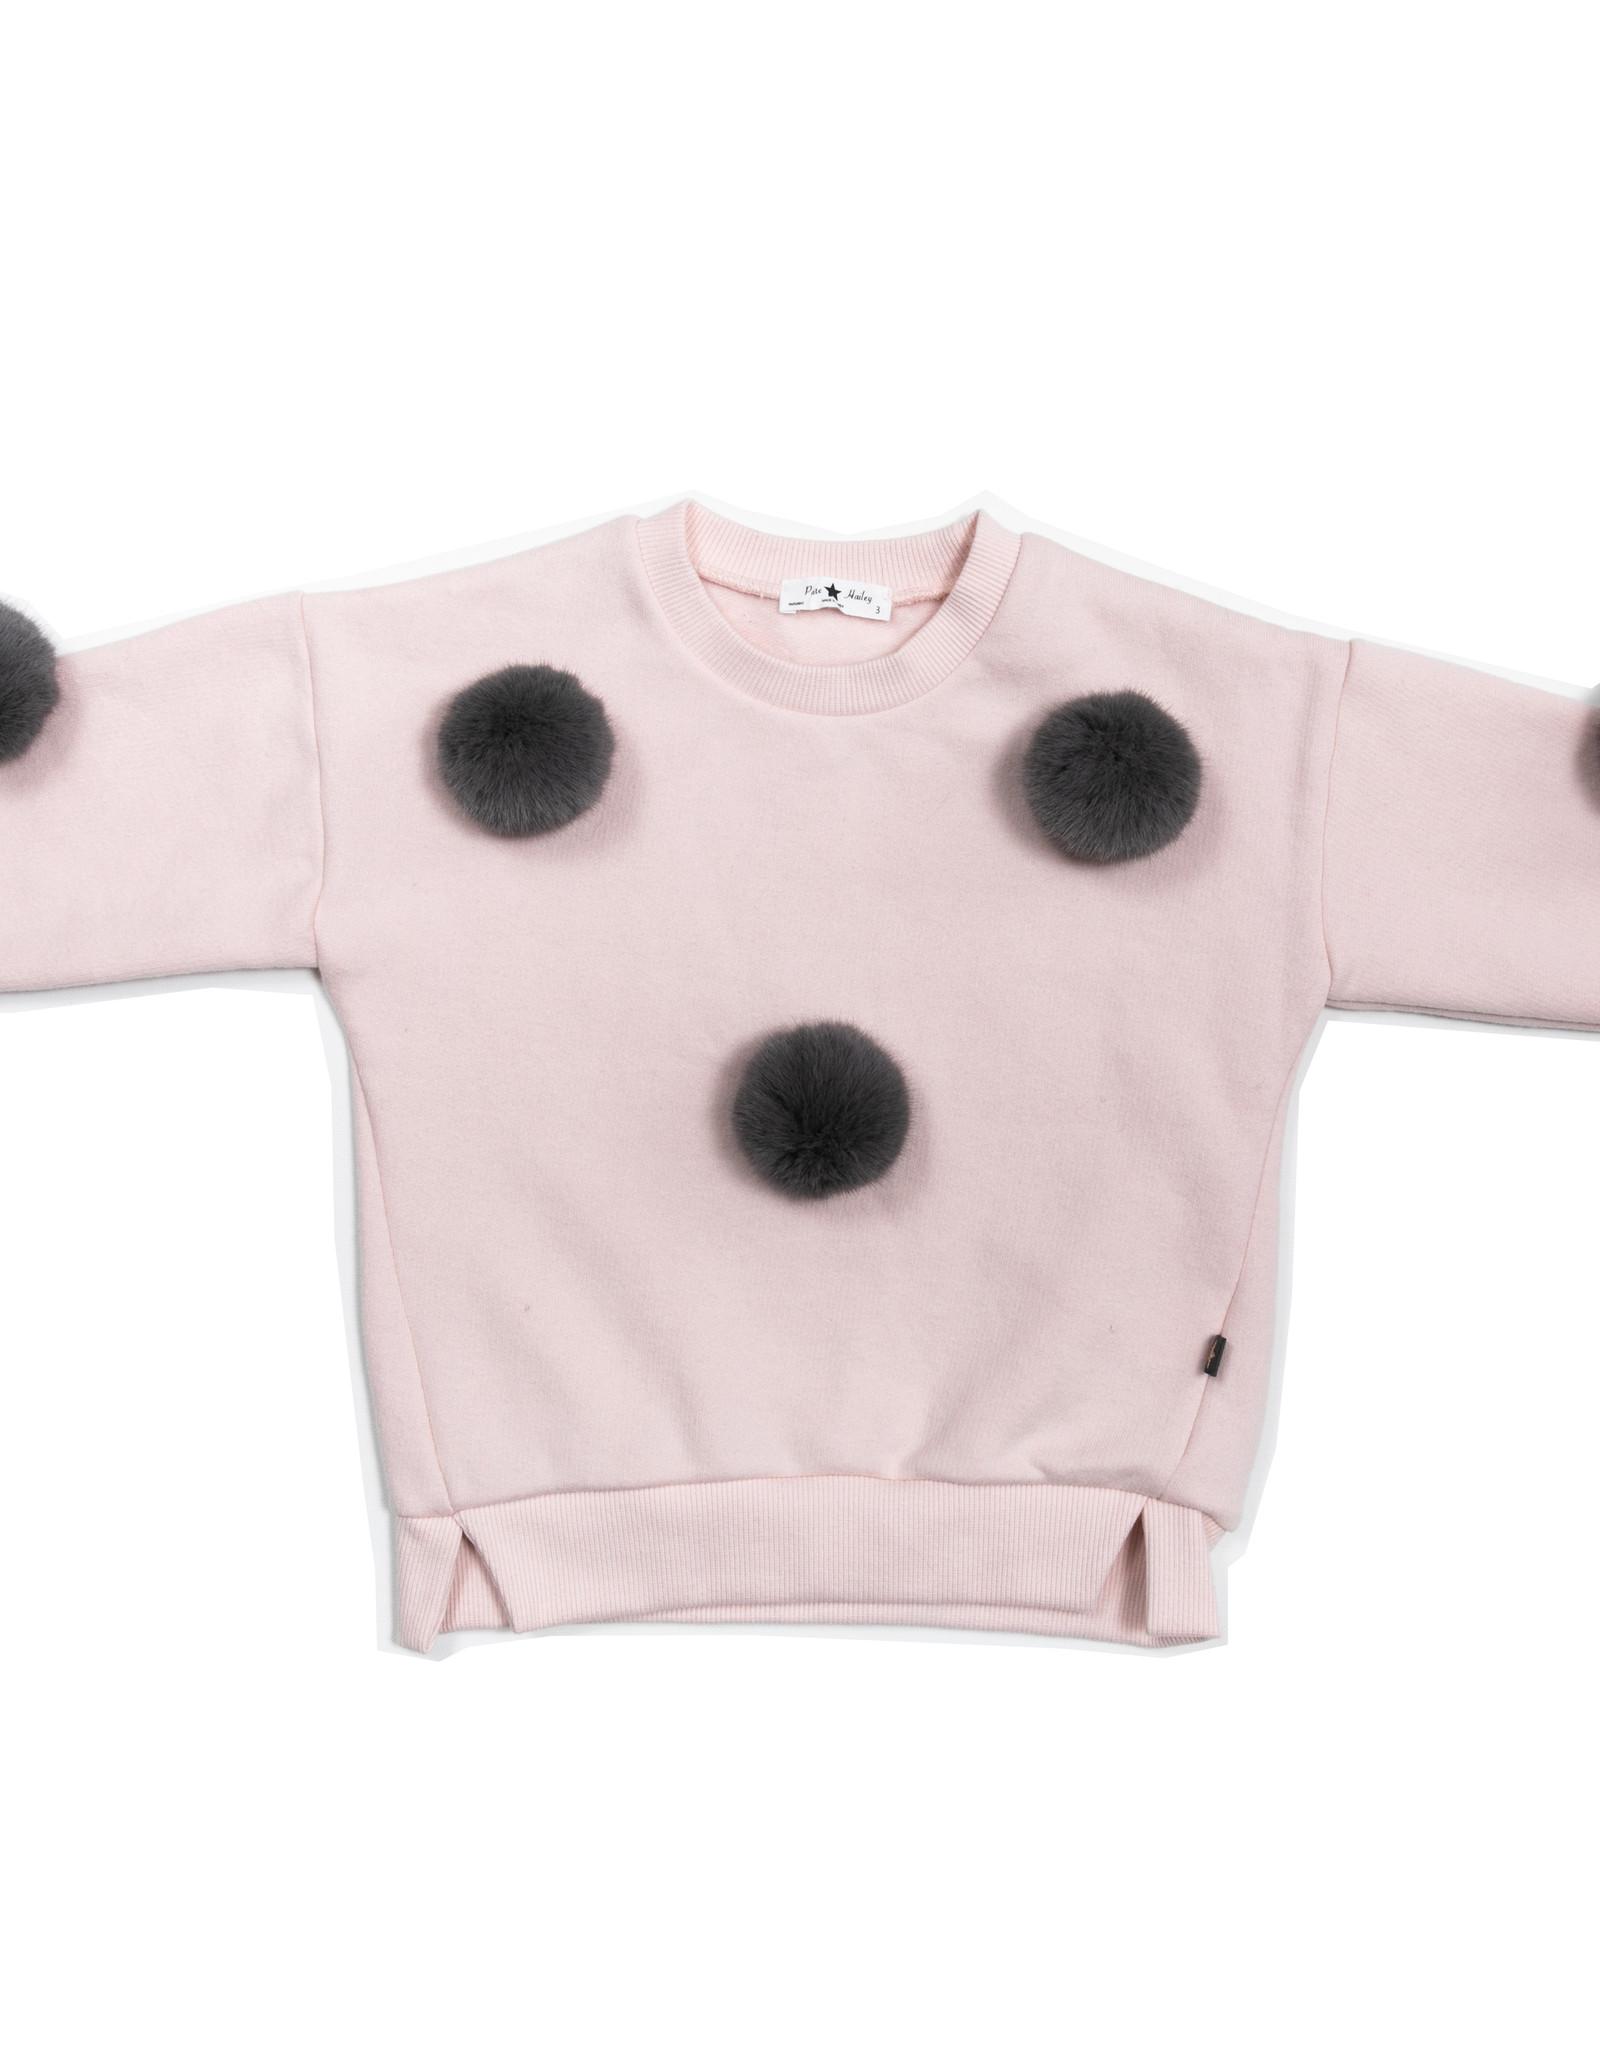 Petite Hailey Petite Hailey Pom Pom Sweater